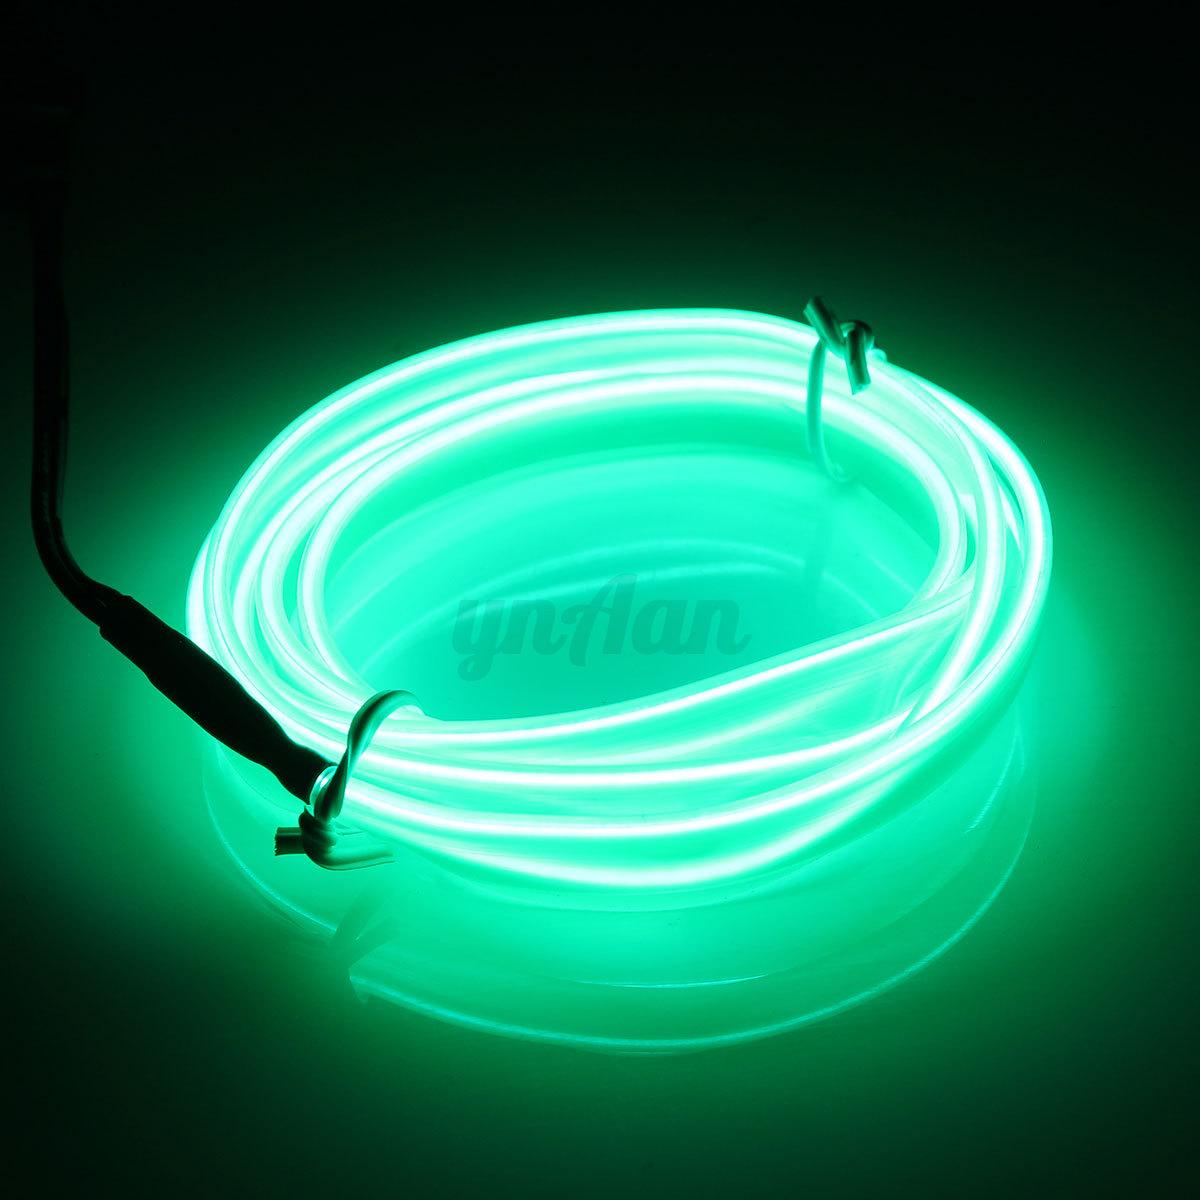 1 3 5m car interior atmosphere glow el wire neonled string strip light rope tube ebay. Black Bedroom Furniture Sets. Home Design Ideas